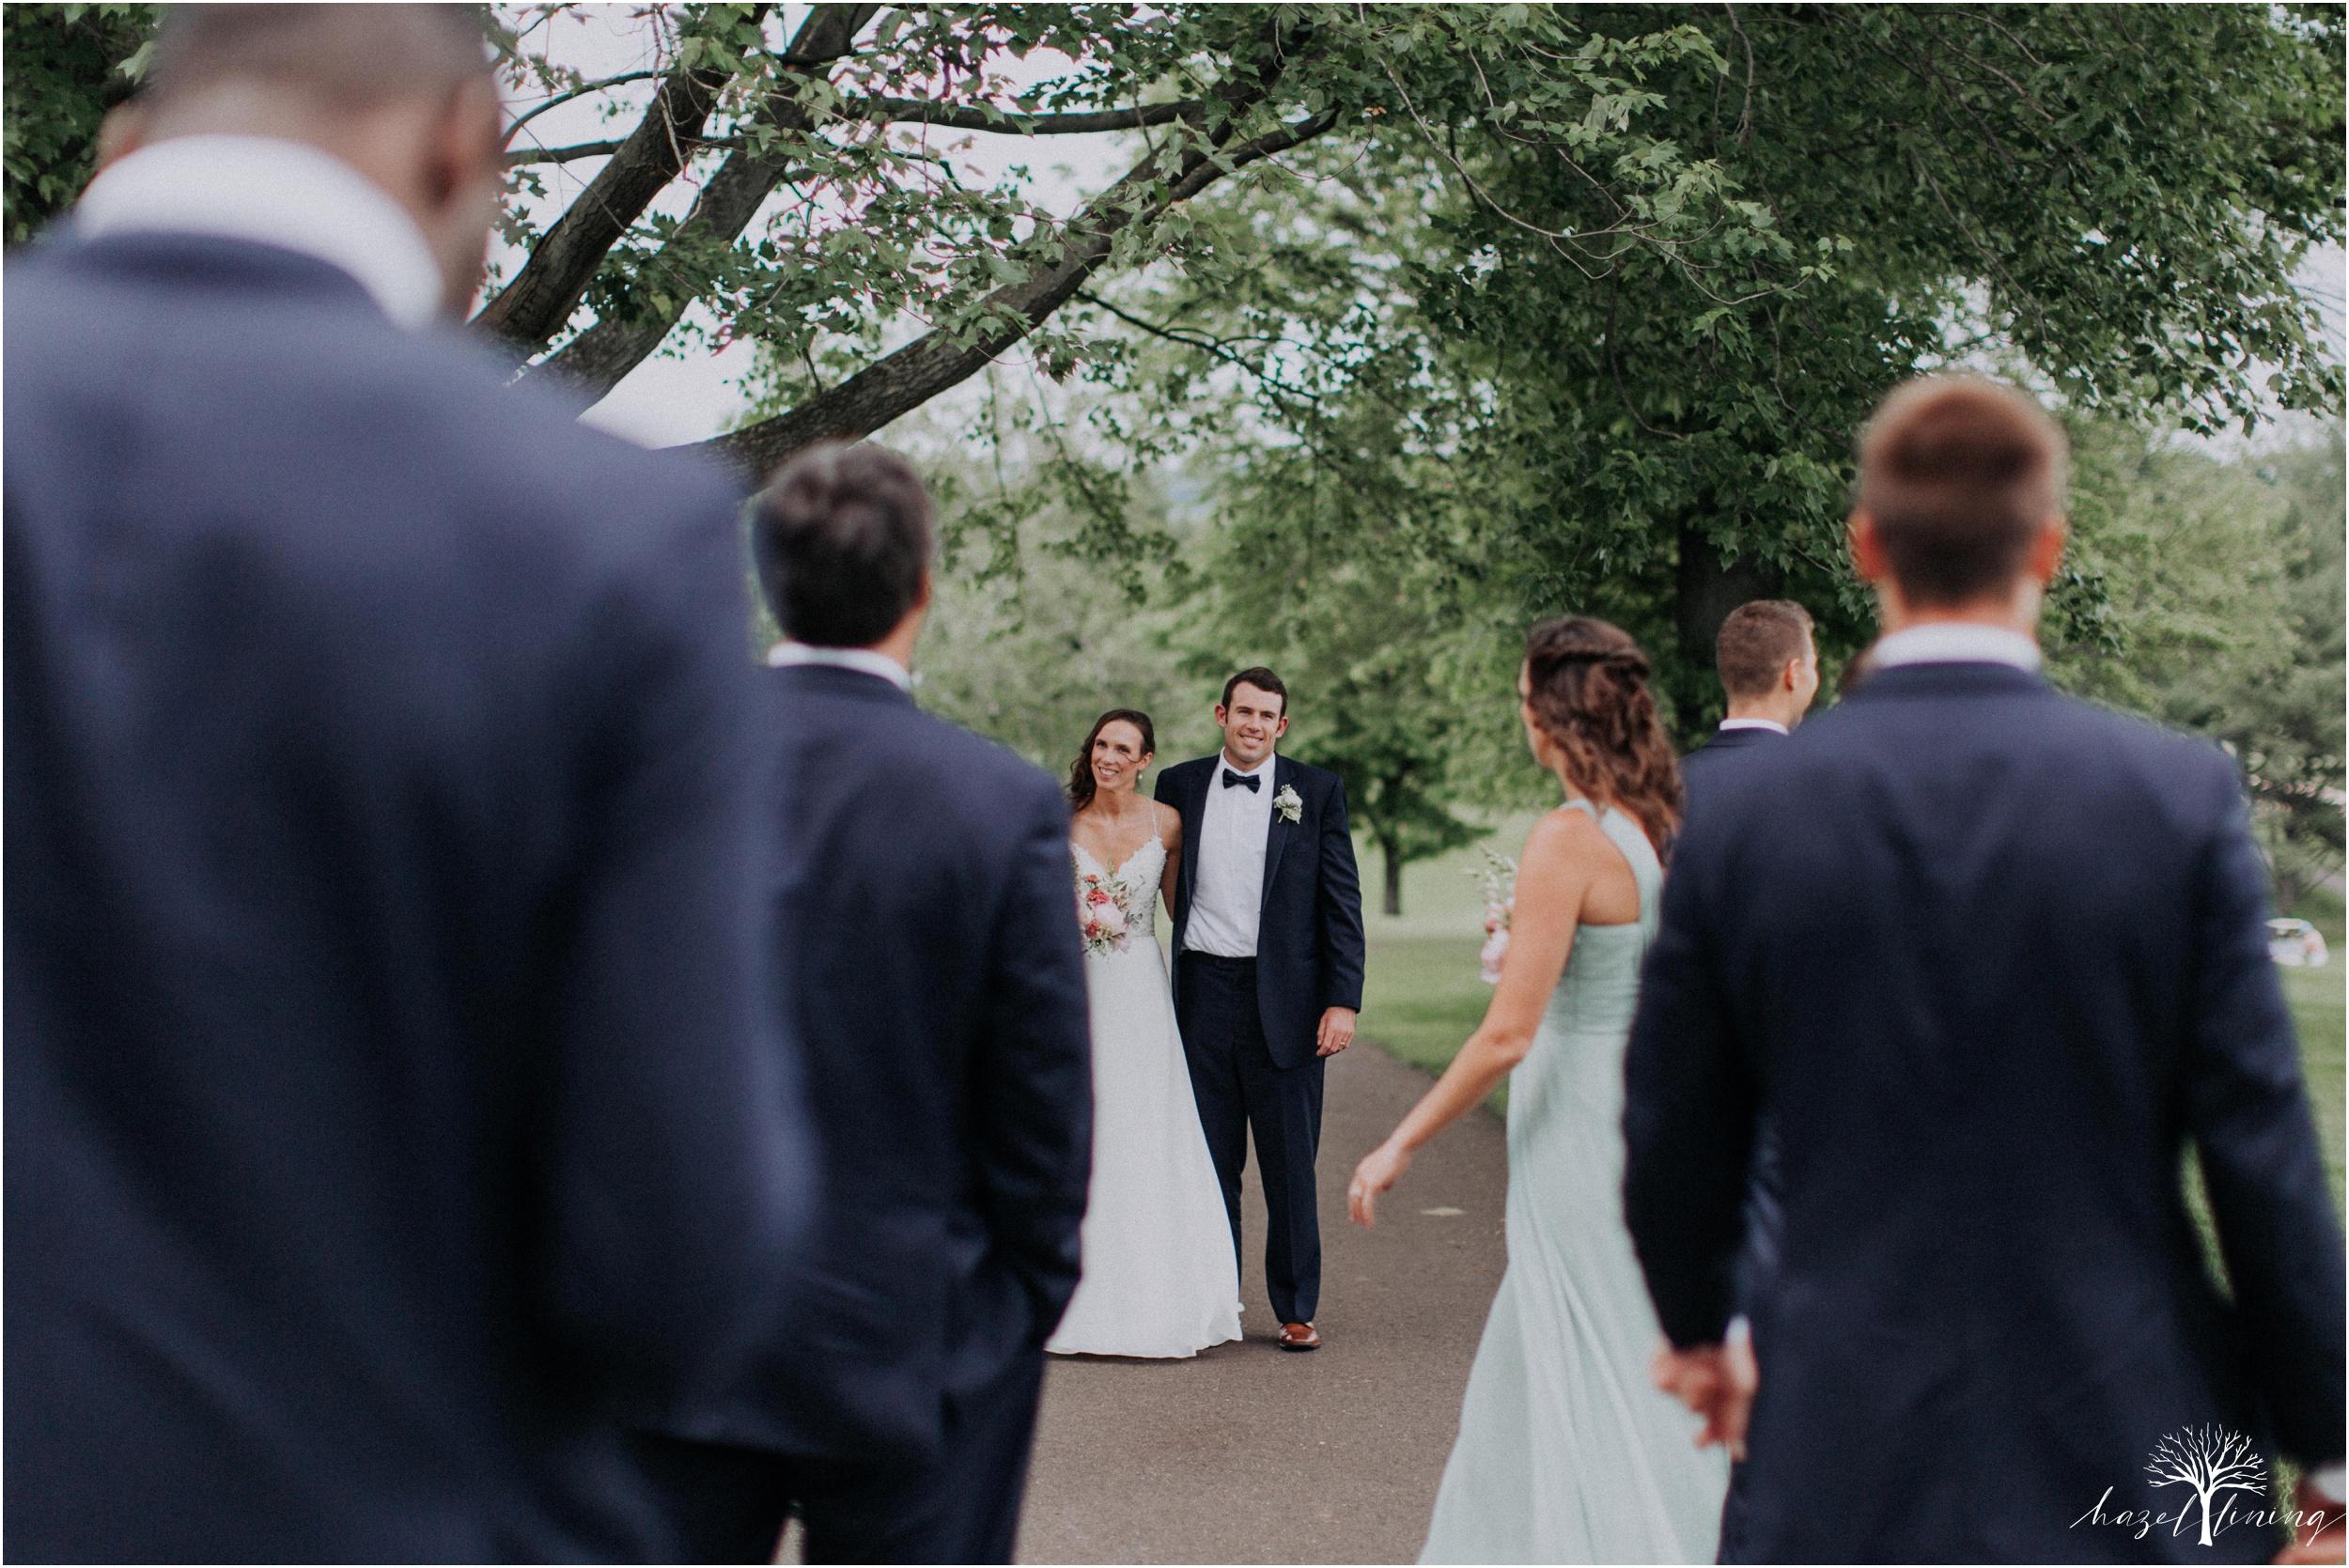 hazel-lining-travel-wedding-elopement-photography_0072.jpg